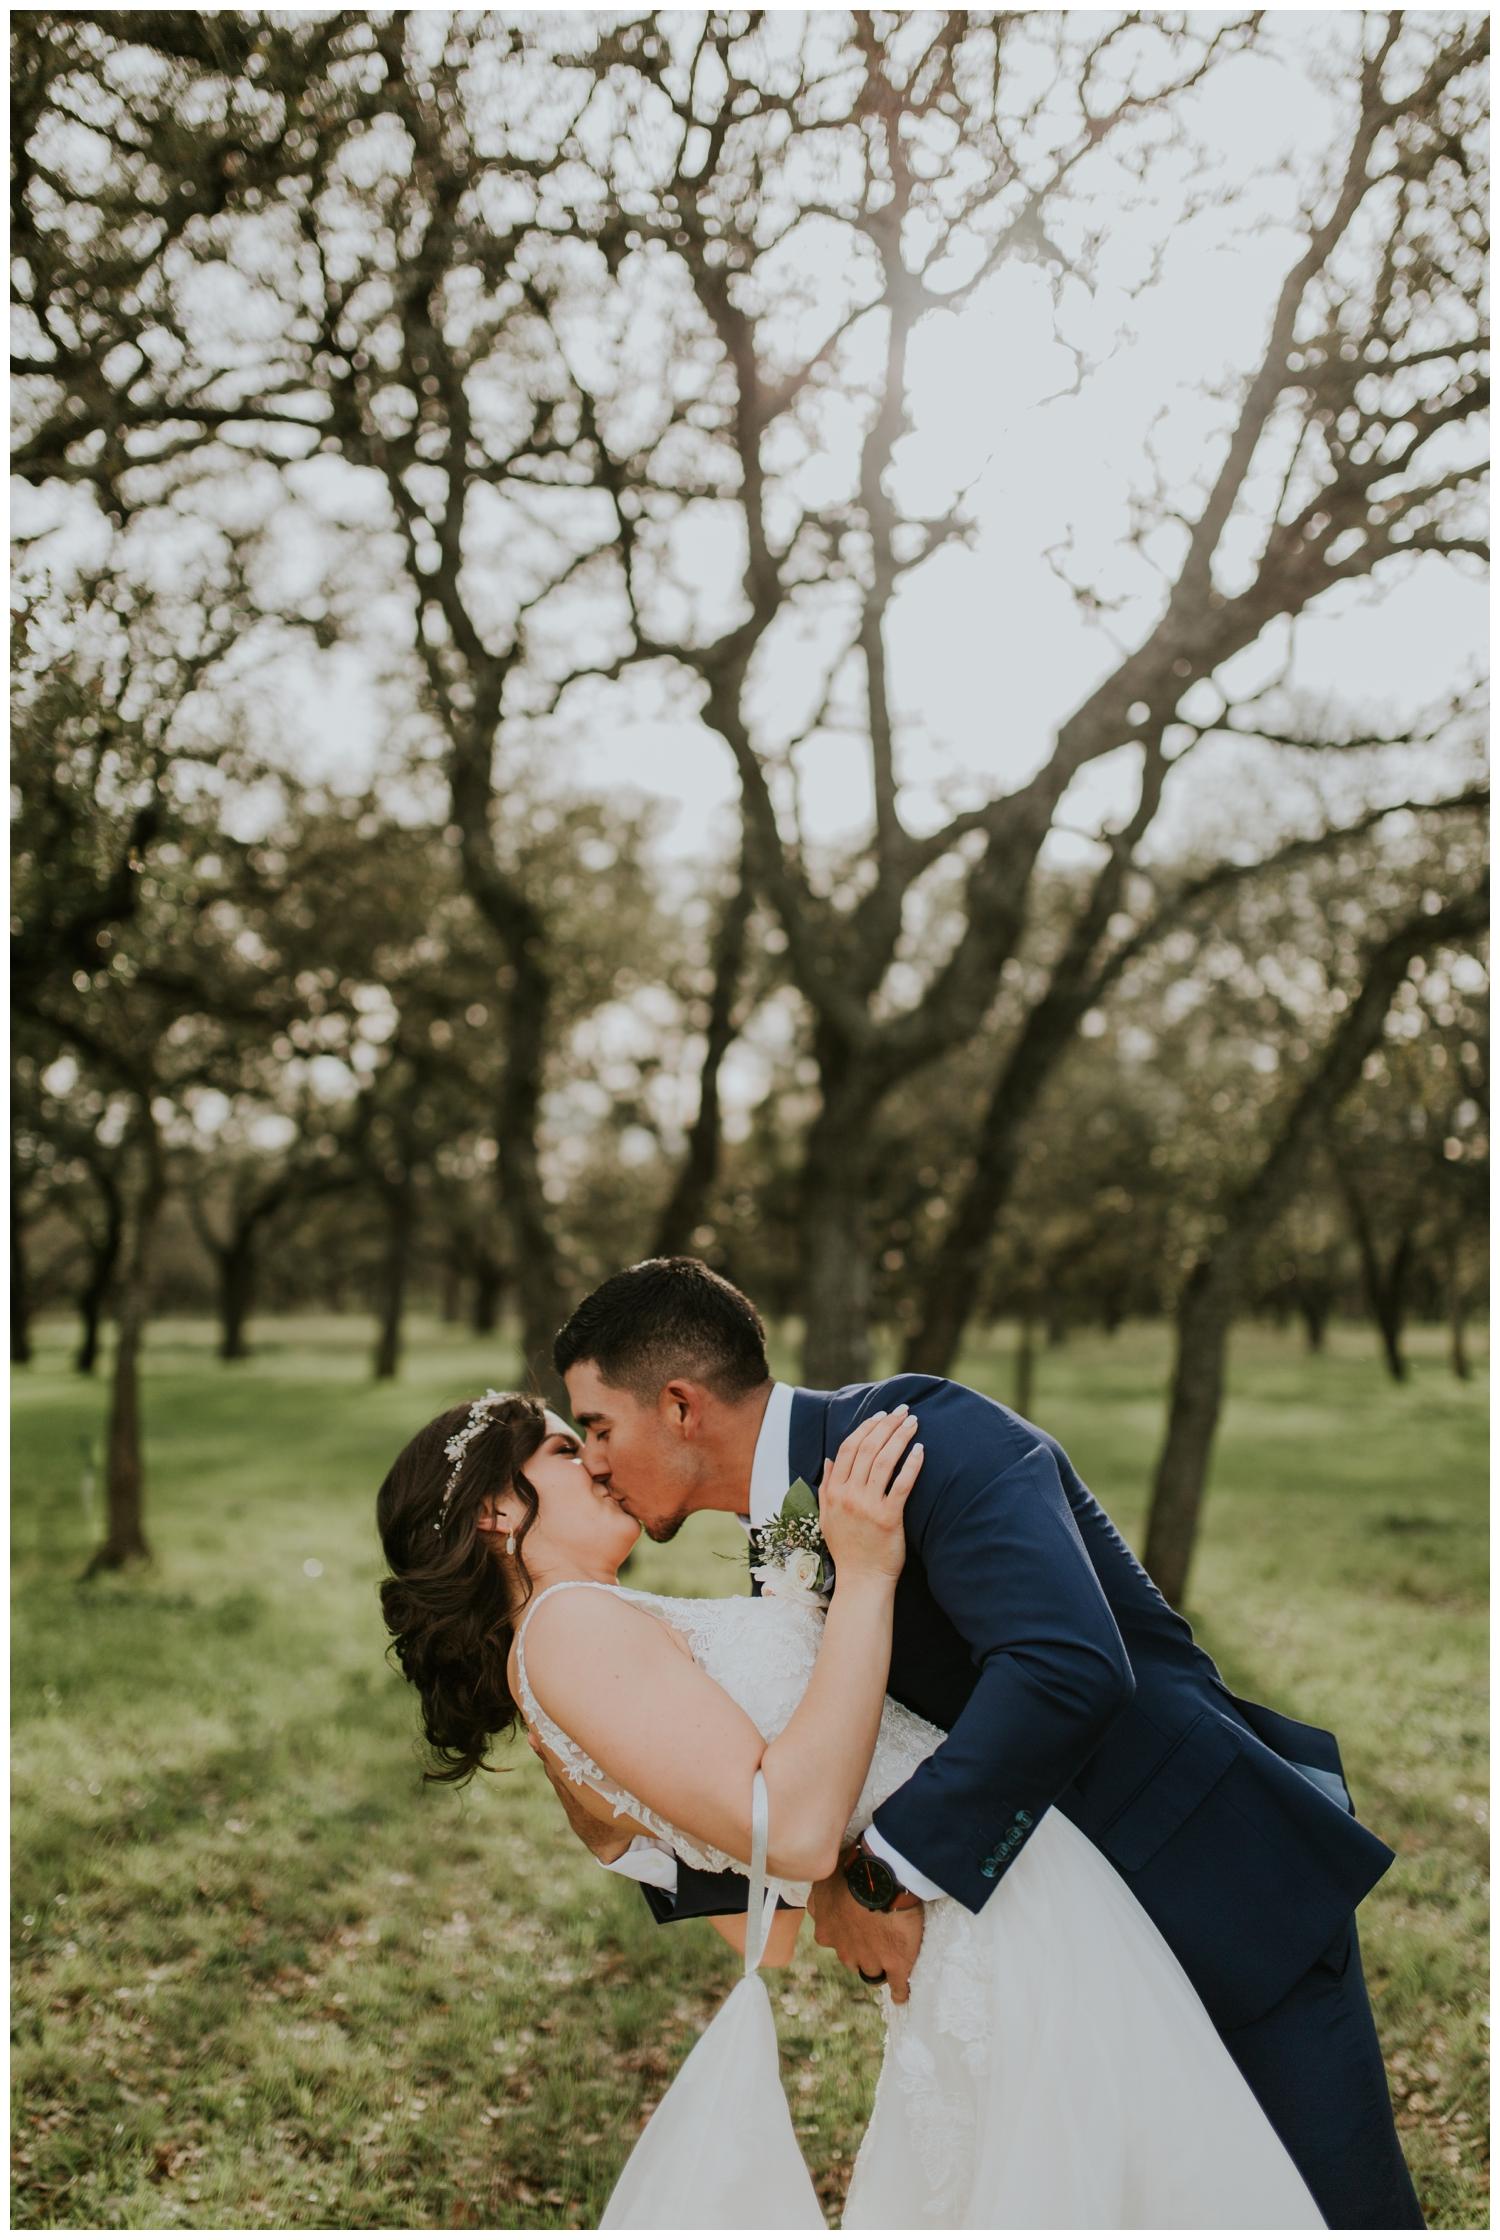 Ashlee+Mike, Featherstone Ranch Spring Wedding, San Antonio, Contista Productions Wedding Photography_0016.jpg